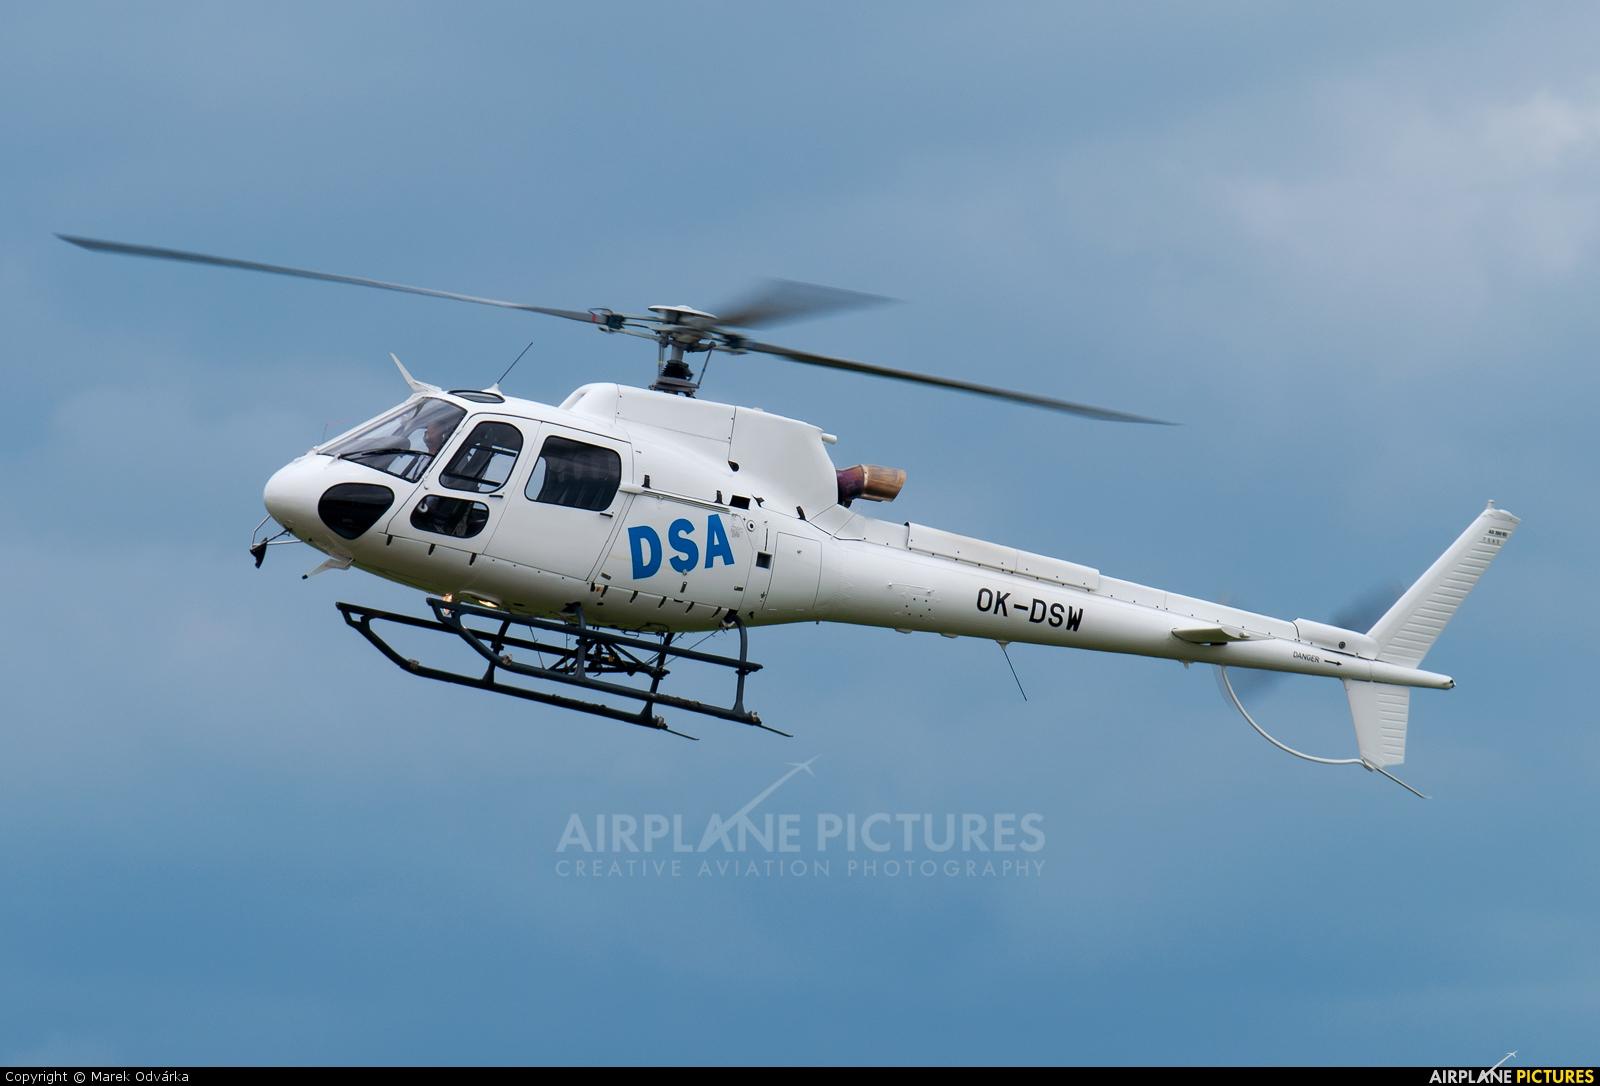 DSA - Delta System Air OK-DSW aircraft at Hradec Králové